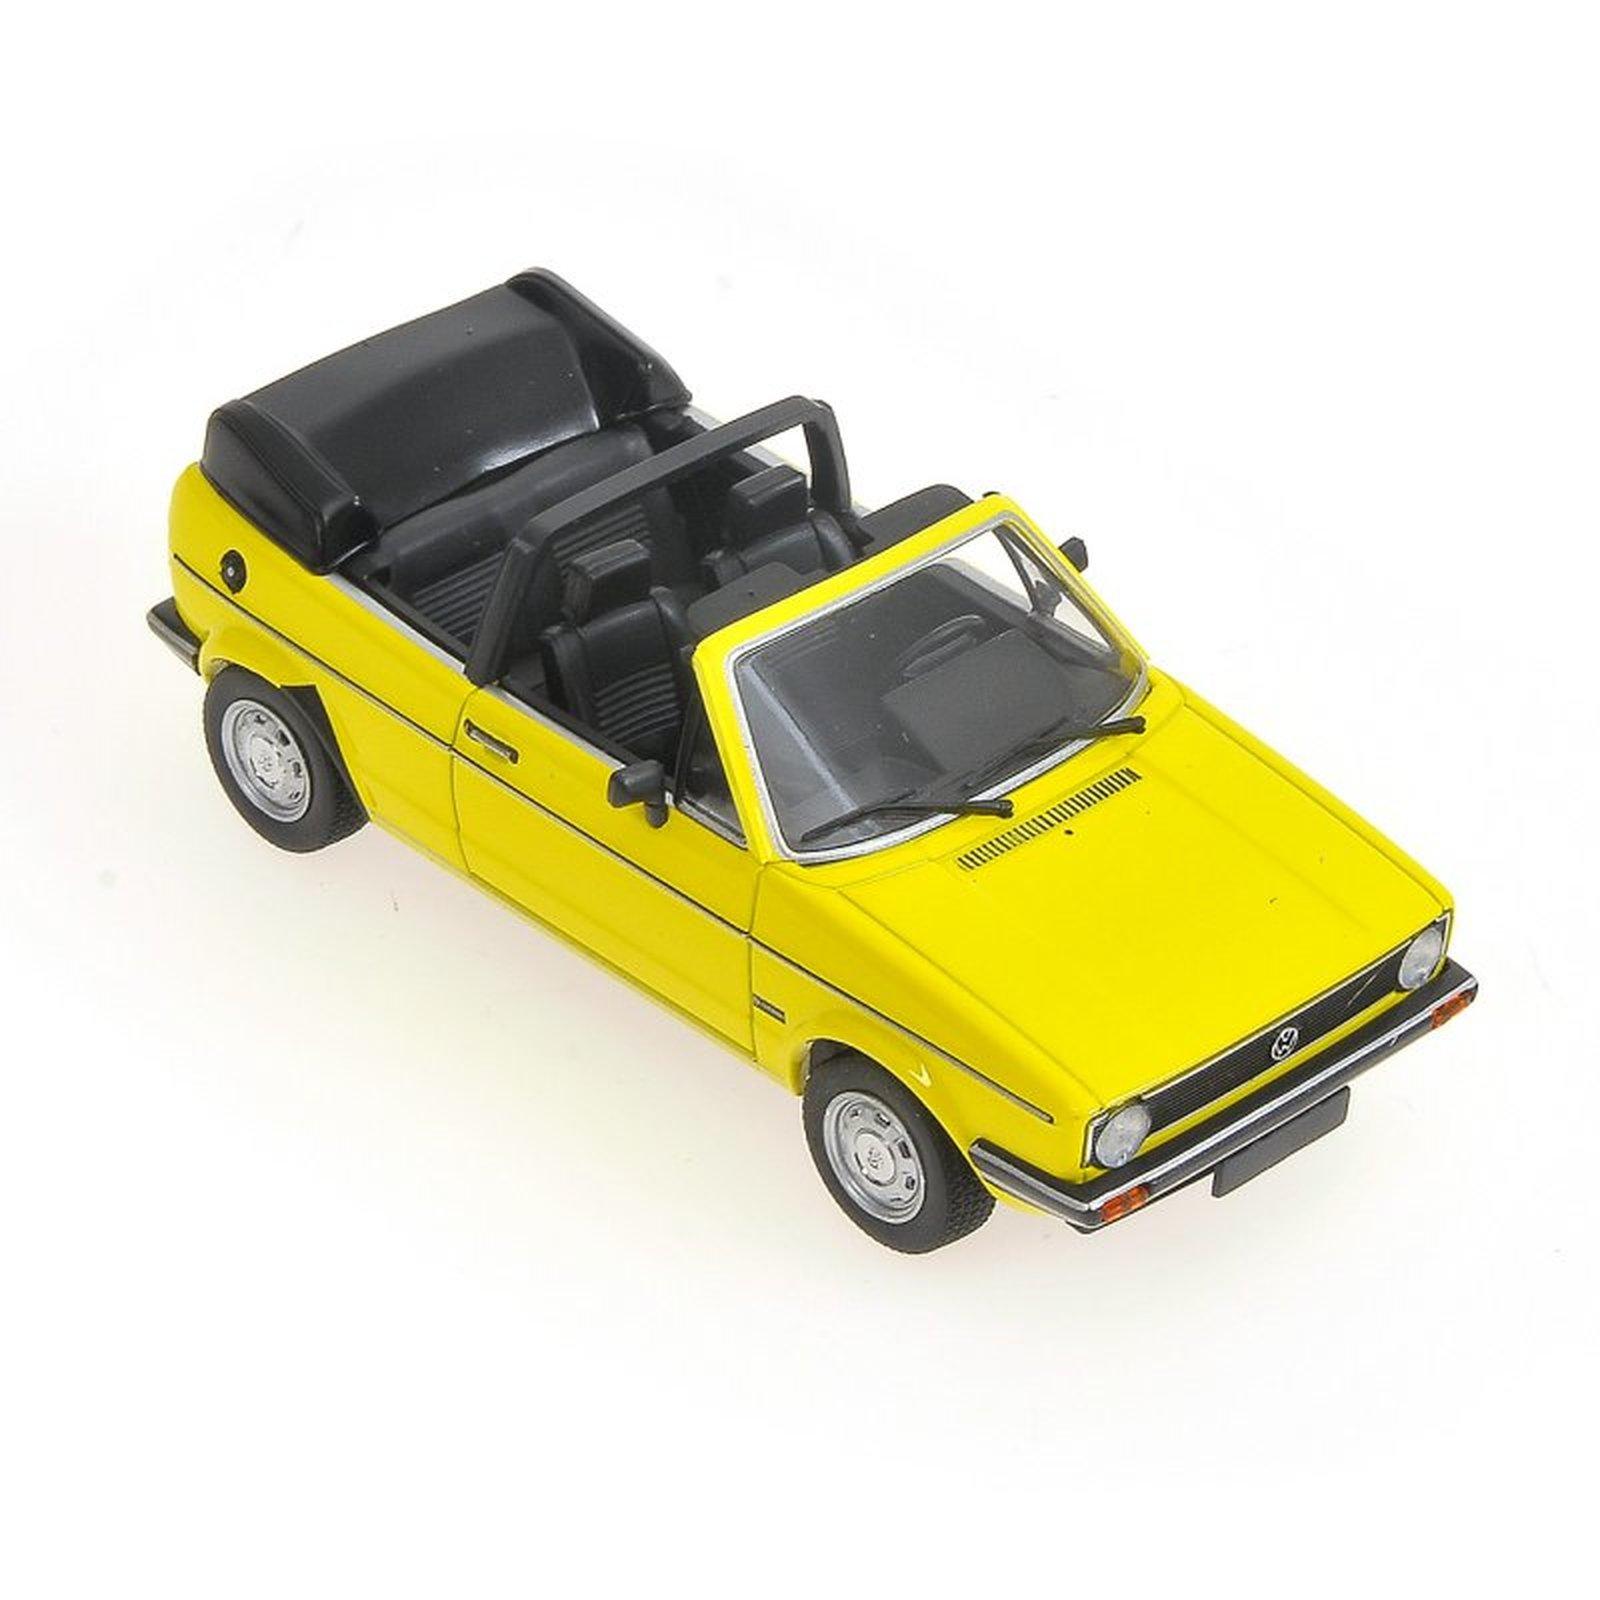 minichamps 400055130 vw golf cabrio gelb 1980 massstab. Black Bedroom Furniture Sets. Home Design Ideas